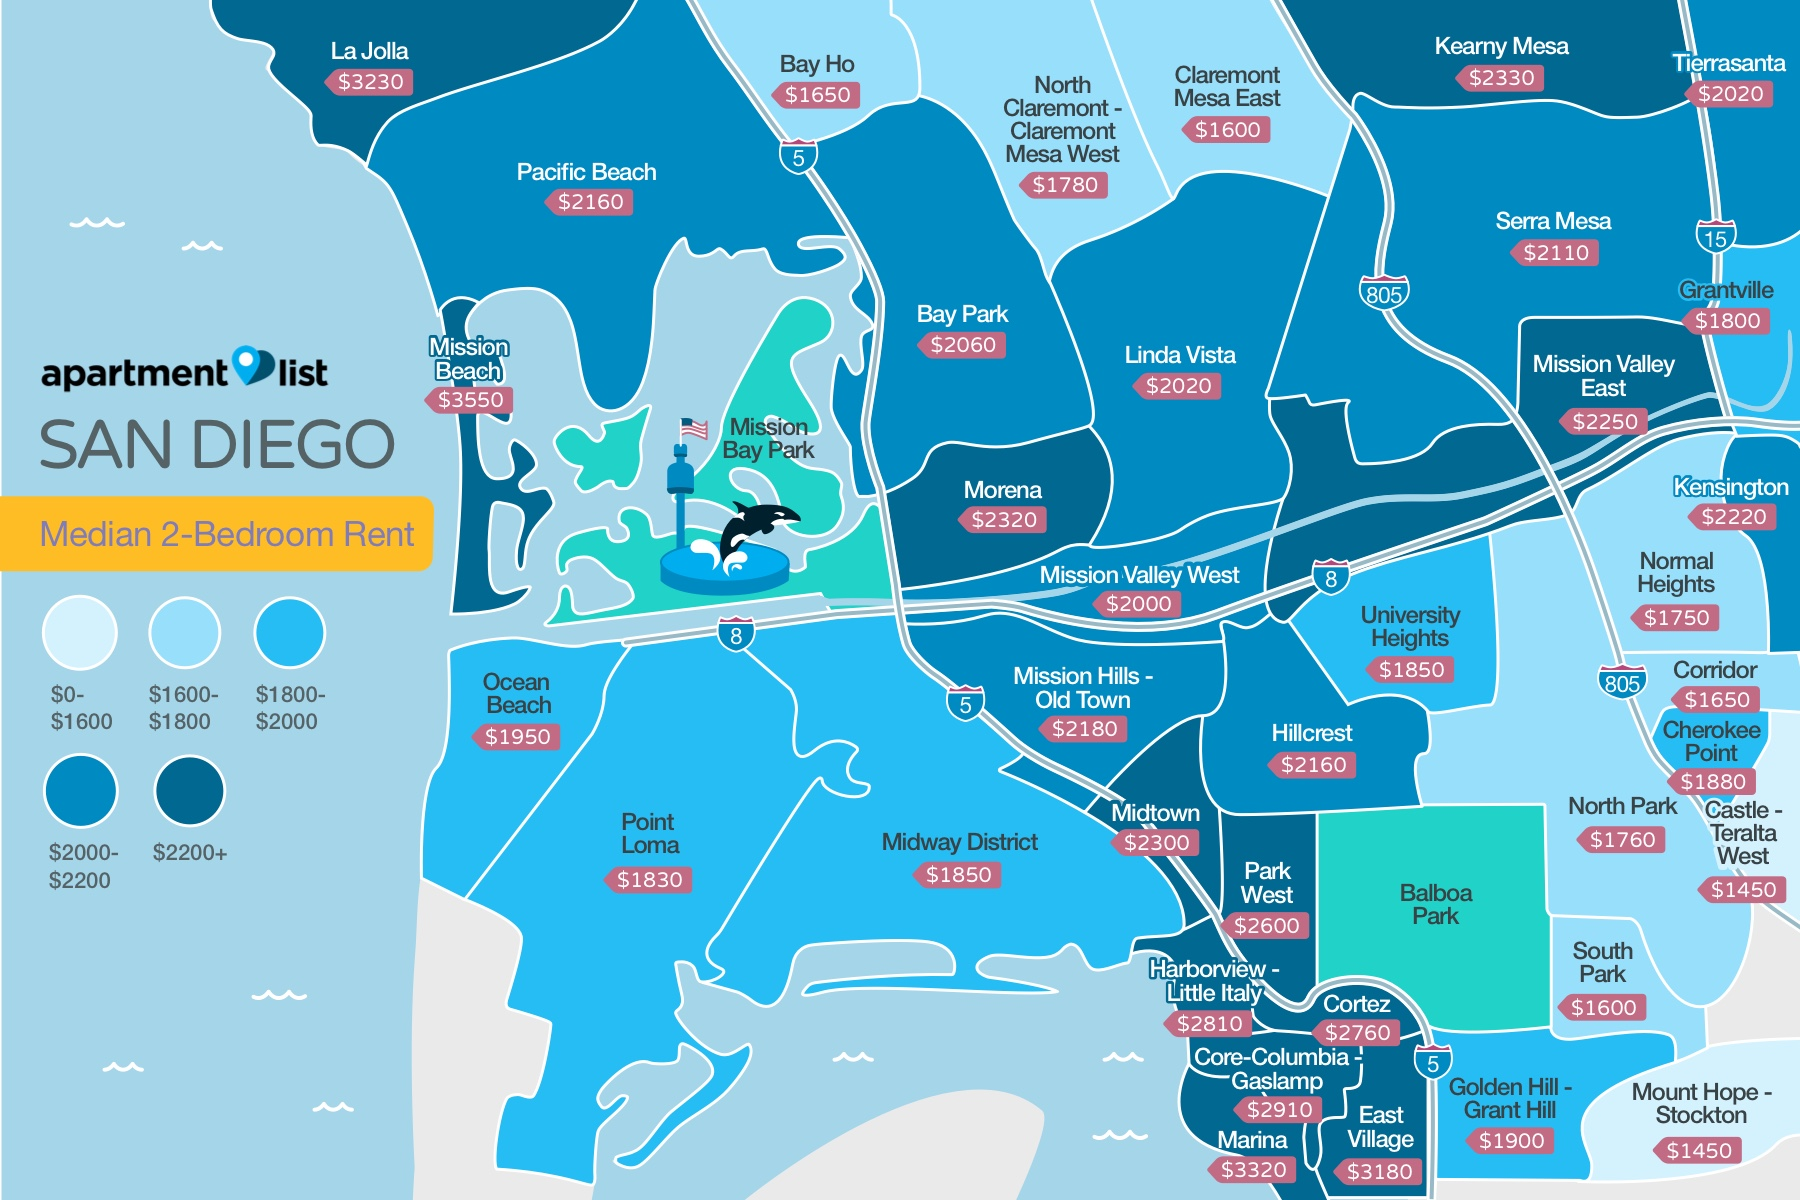 San Diego Neighborhood Price Map